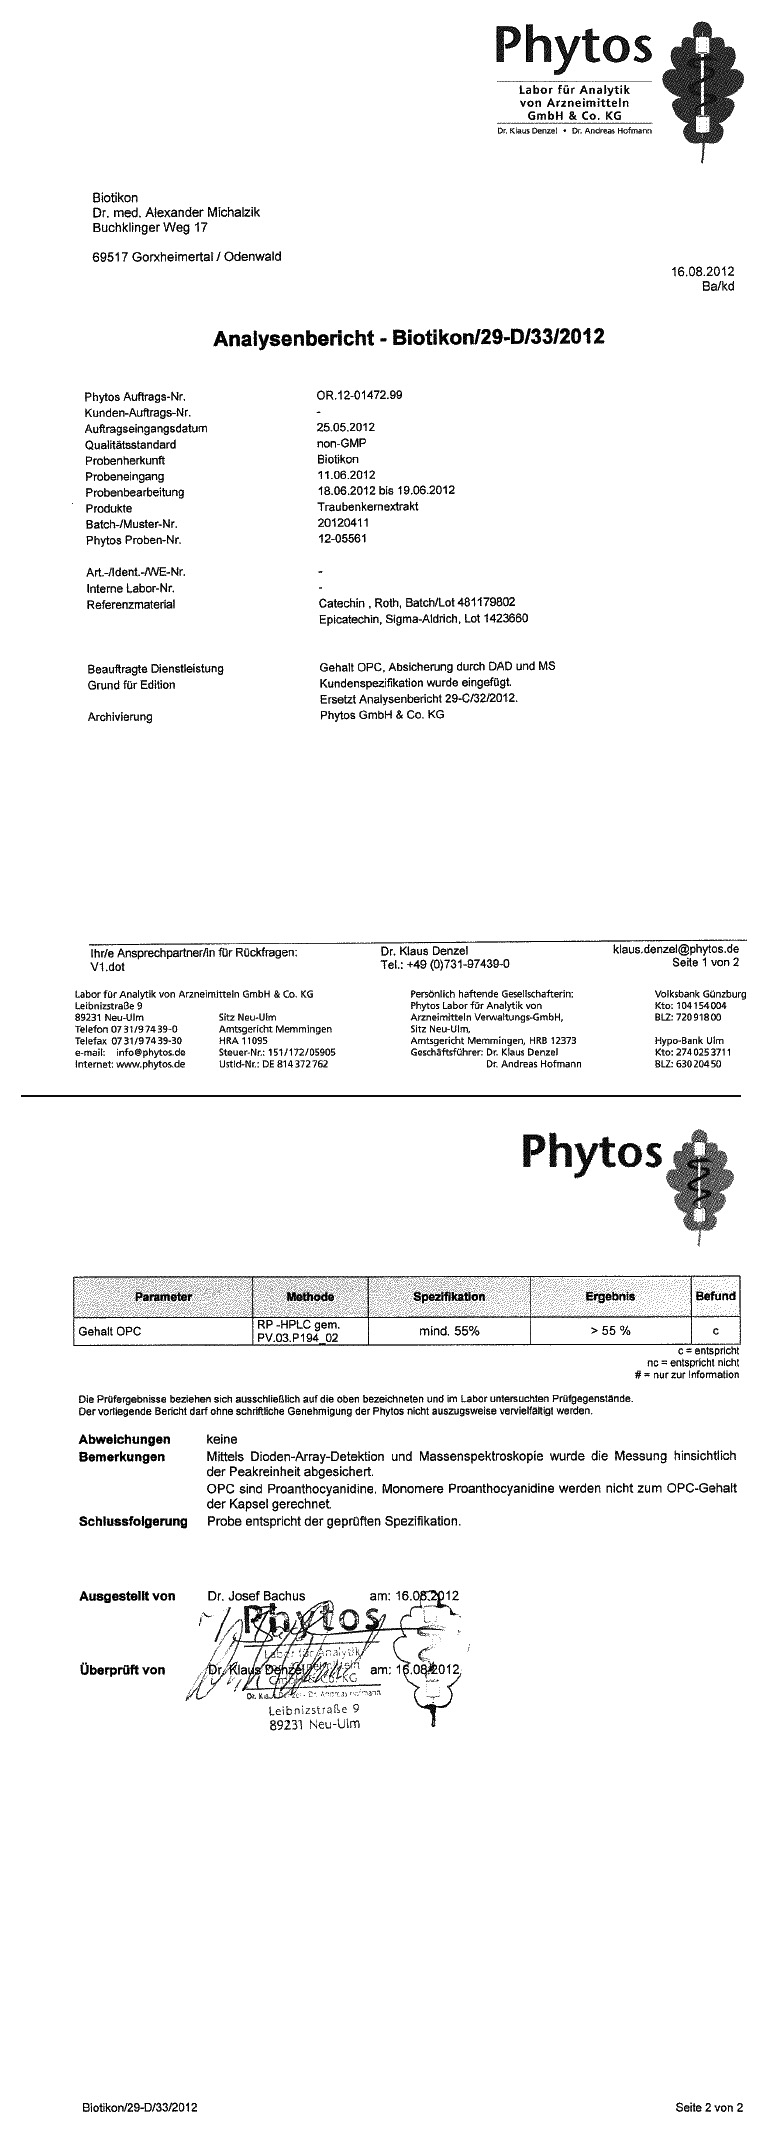 hplc_opc_piperin-pro(2).jpg